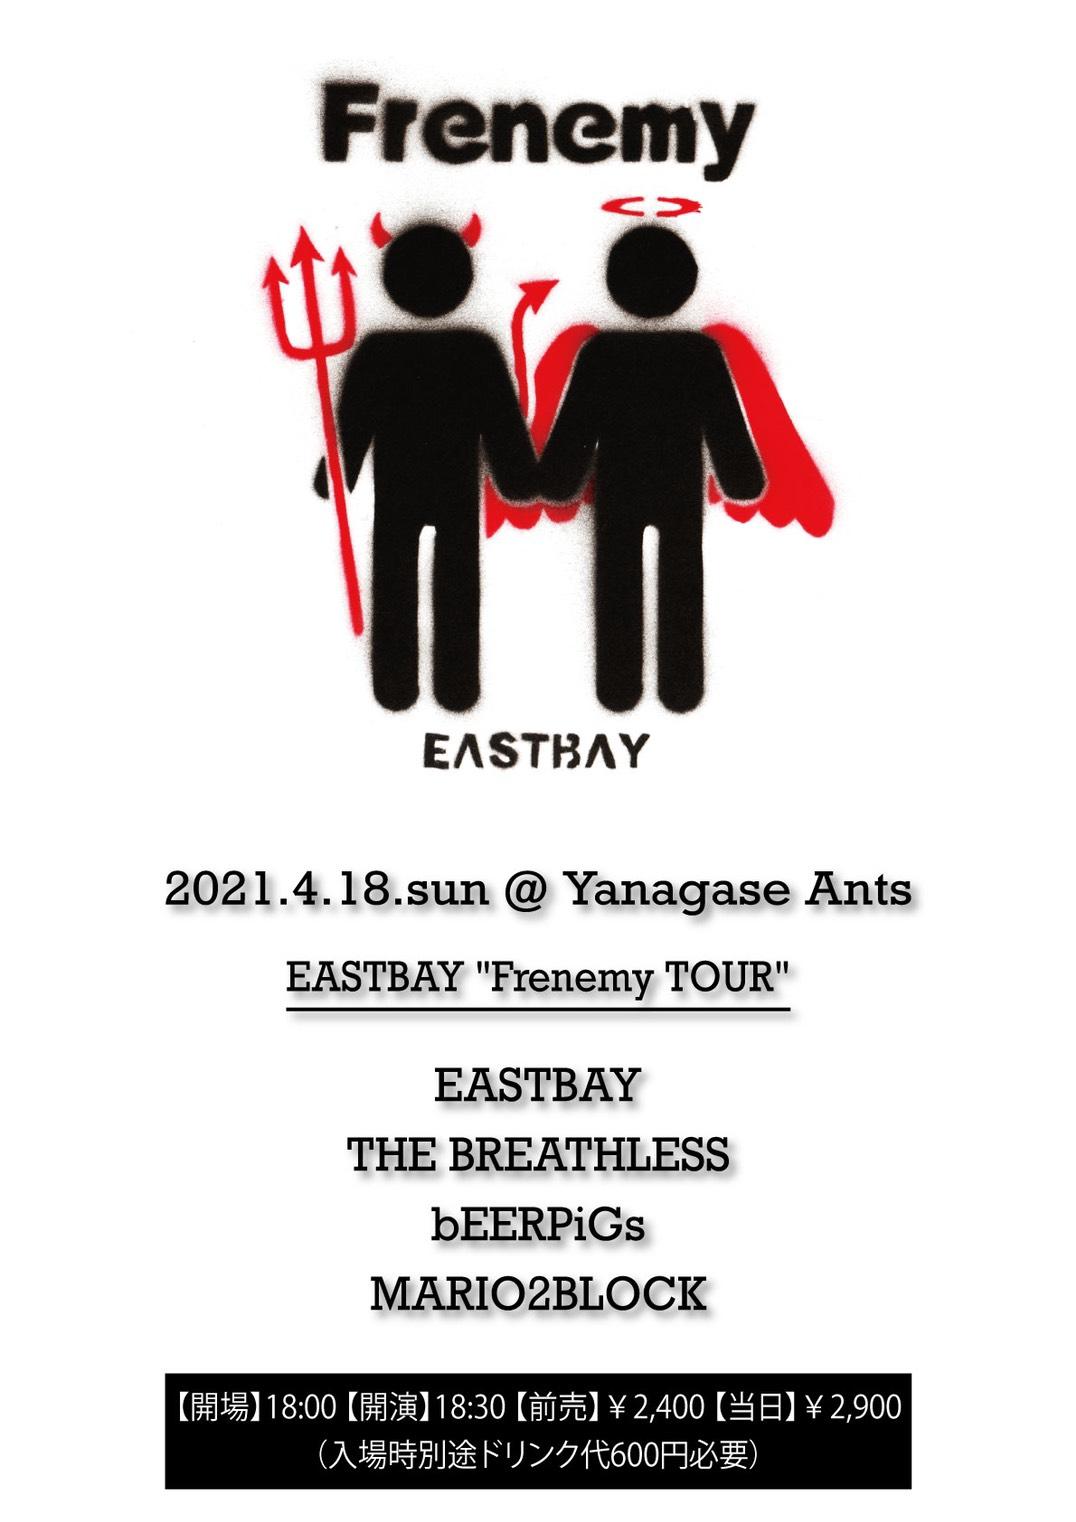 Frenemy TOUR in Yanagaseの写真